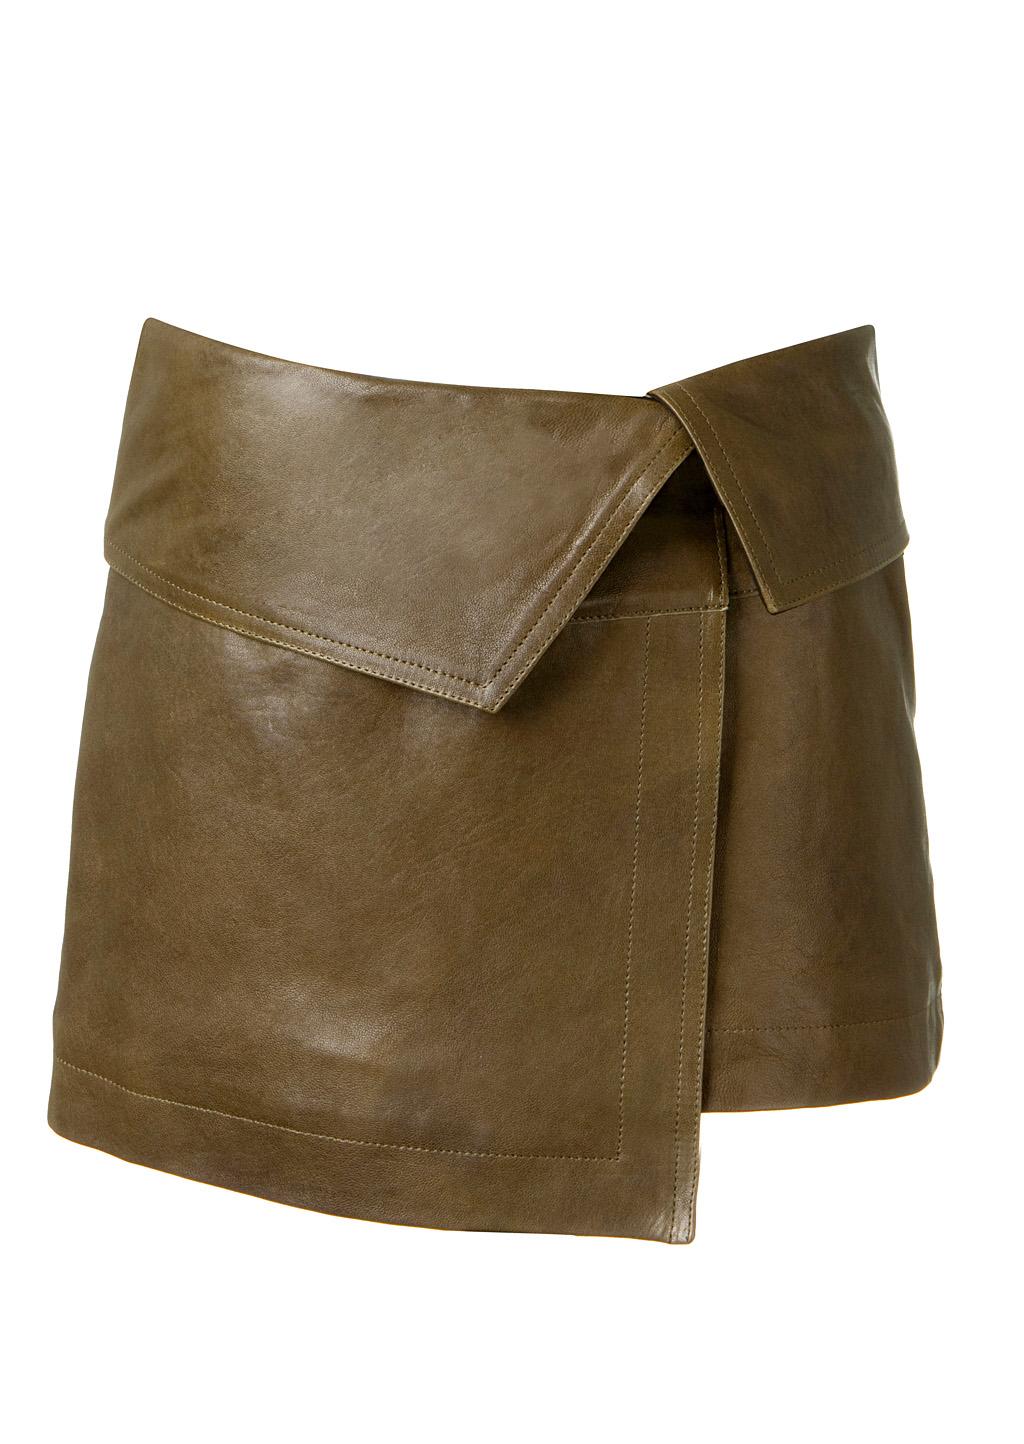 marant bronze wraparound leather skirt in gold